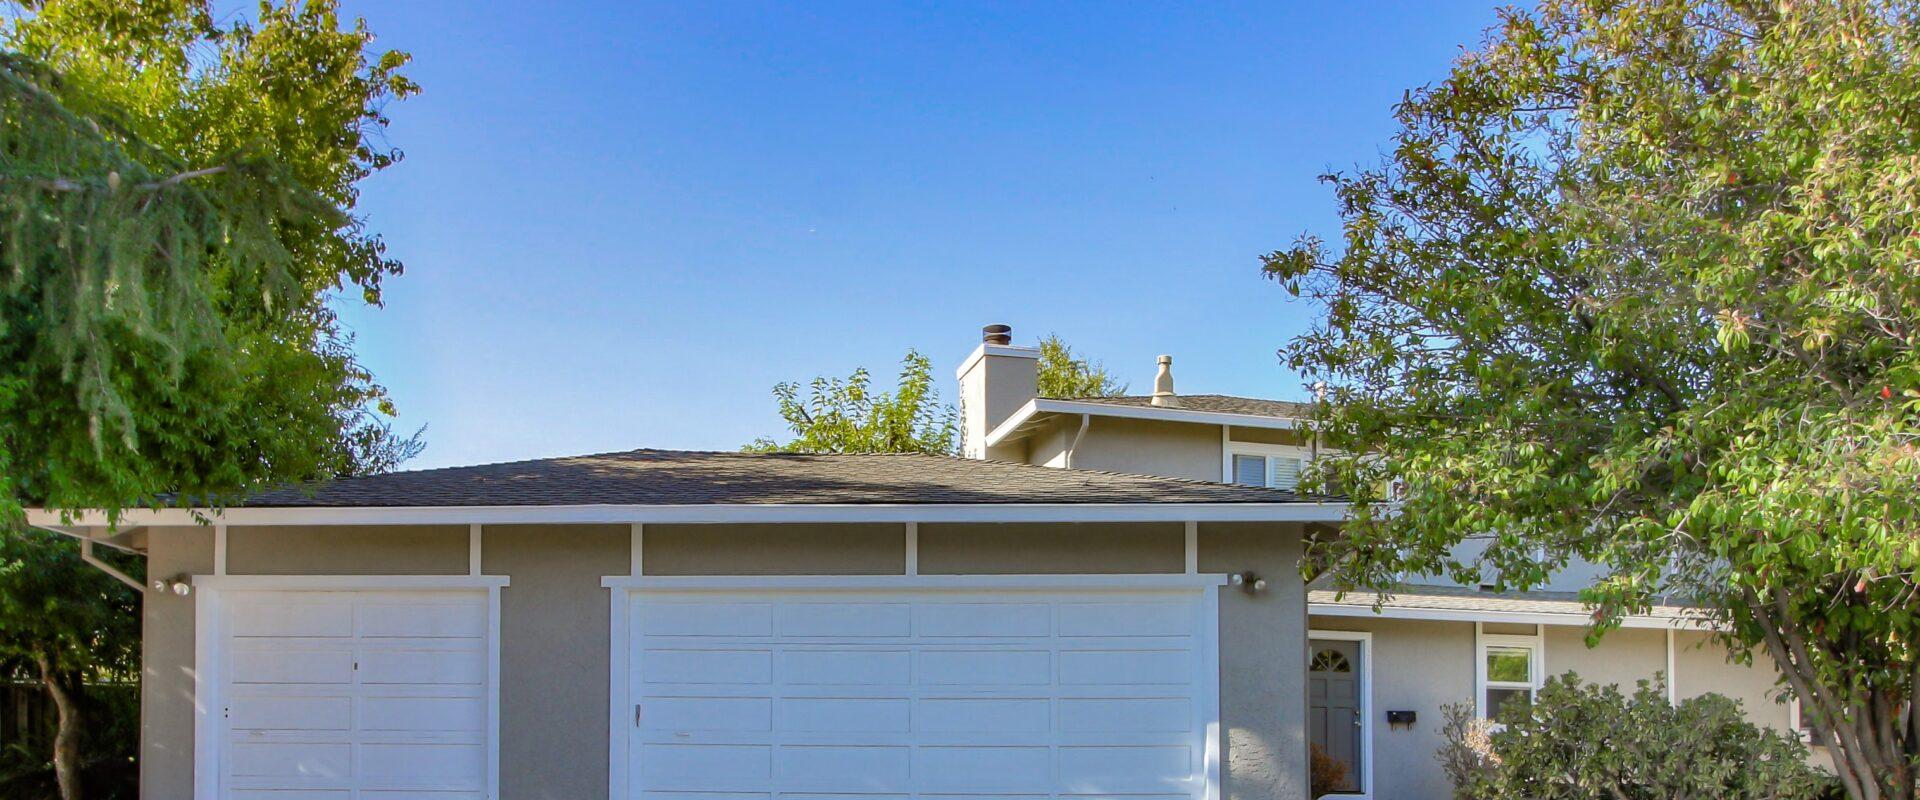 5783/5785 Lilac Blossom Lane, San Jose, CA 95124